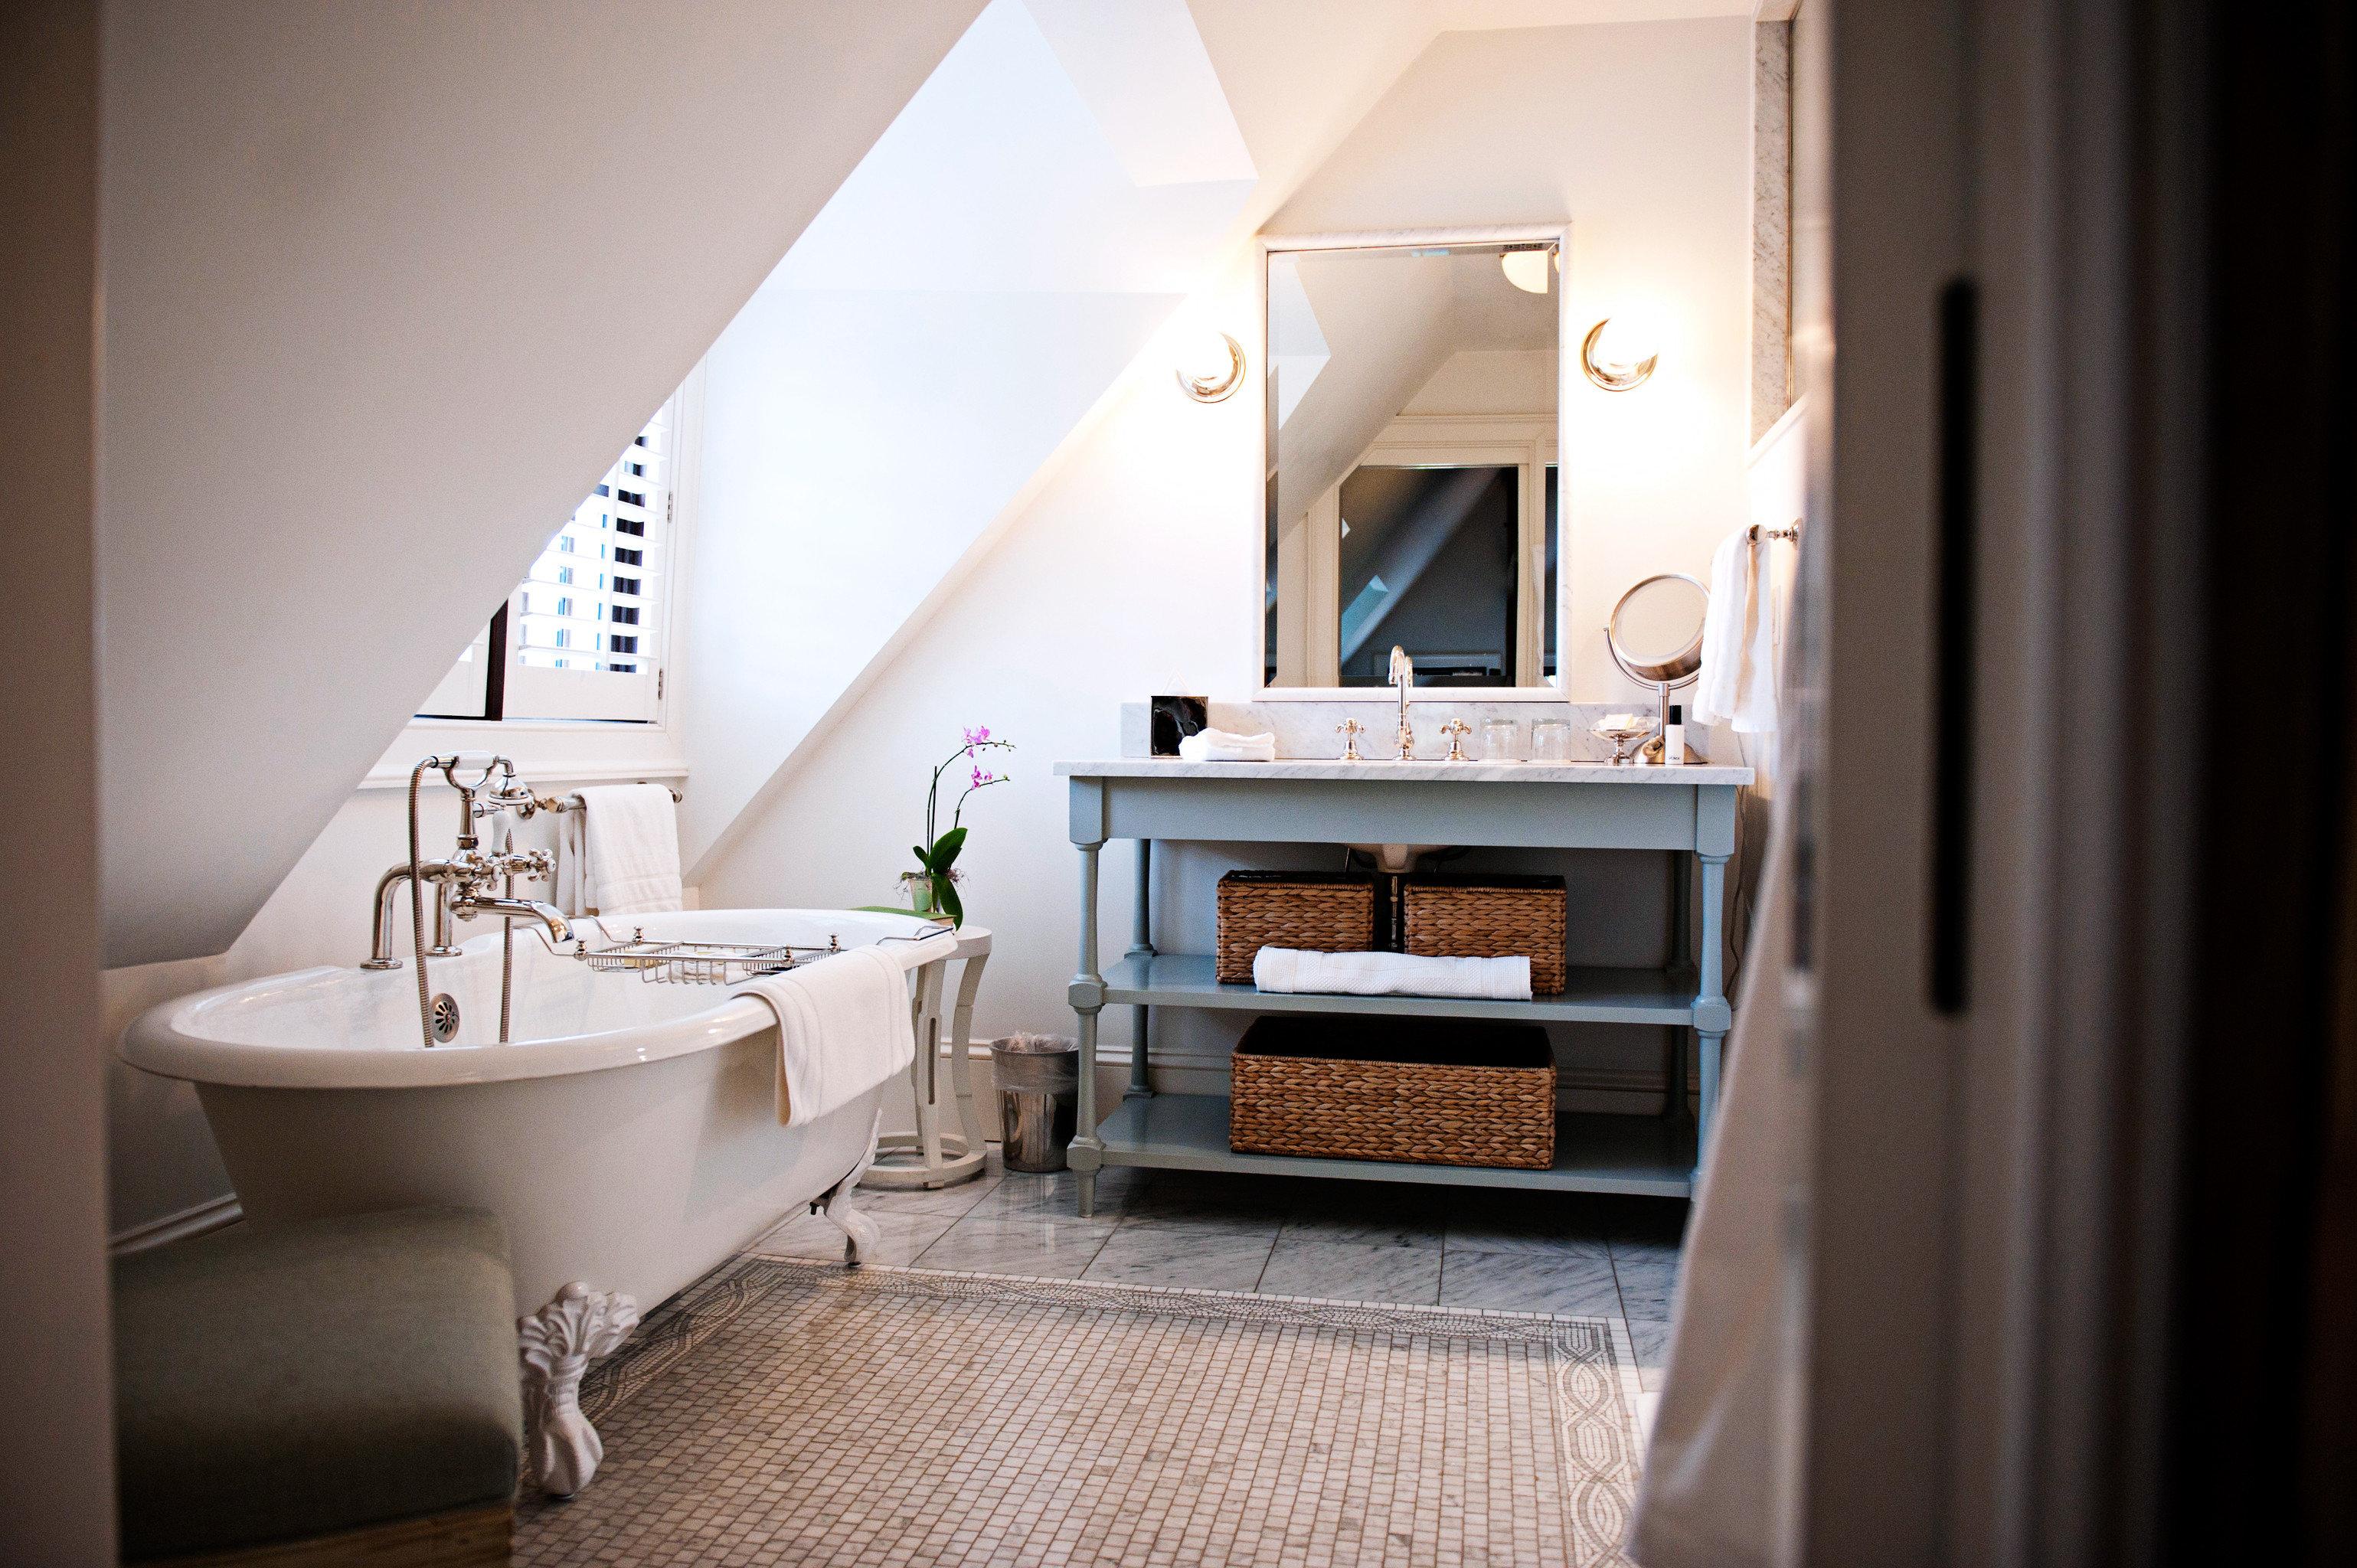 Bath Celebs Country Hotels Inn Luxury Modern bathroom property house home Suite sink cottage living room tub bathtub